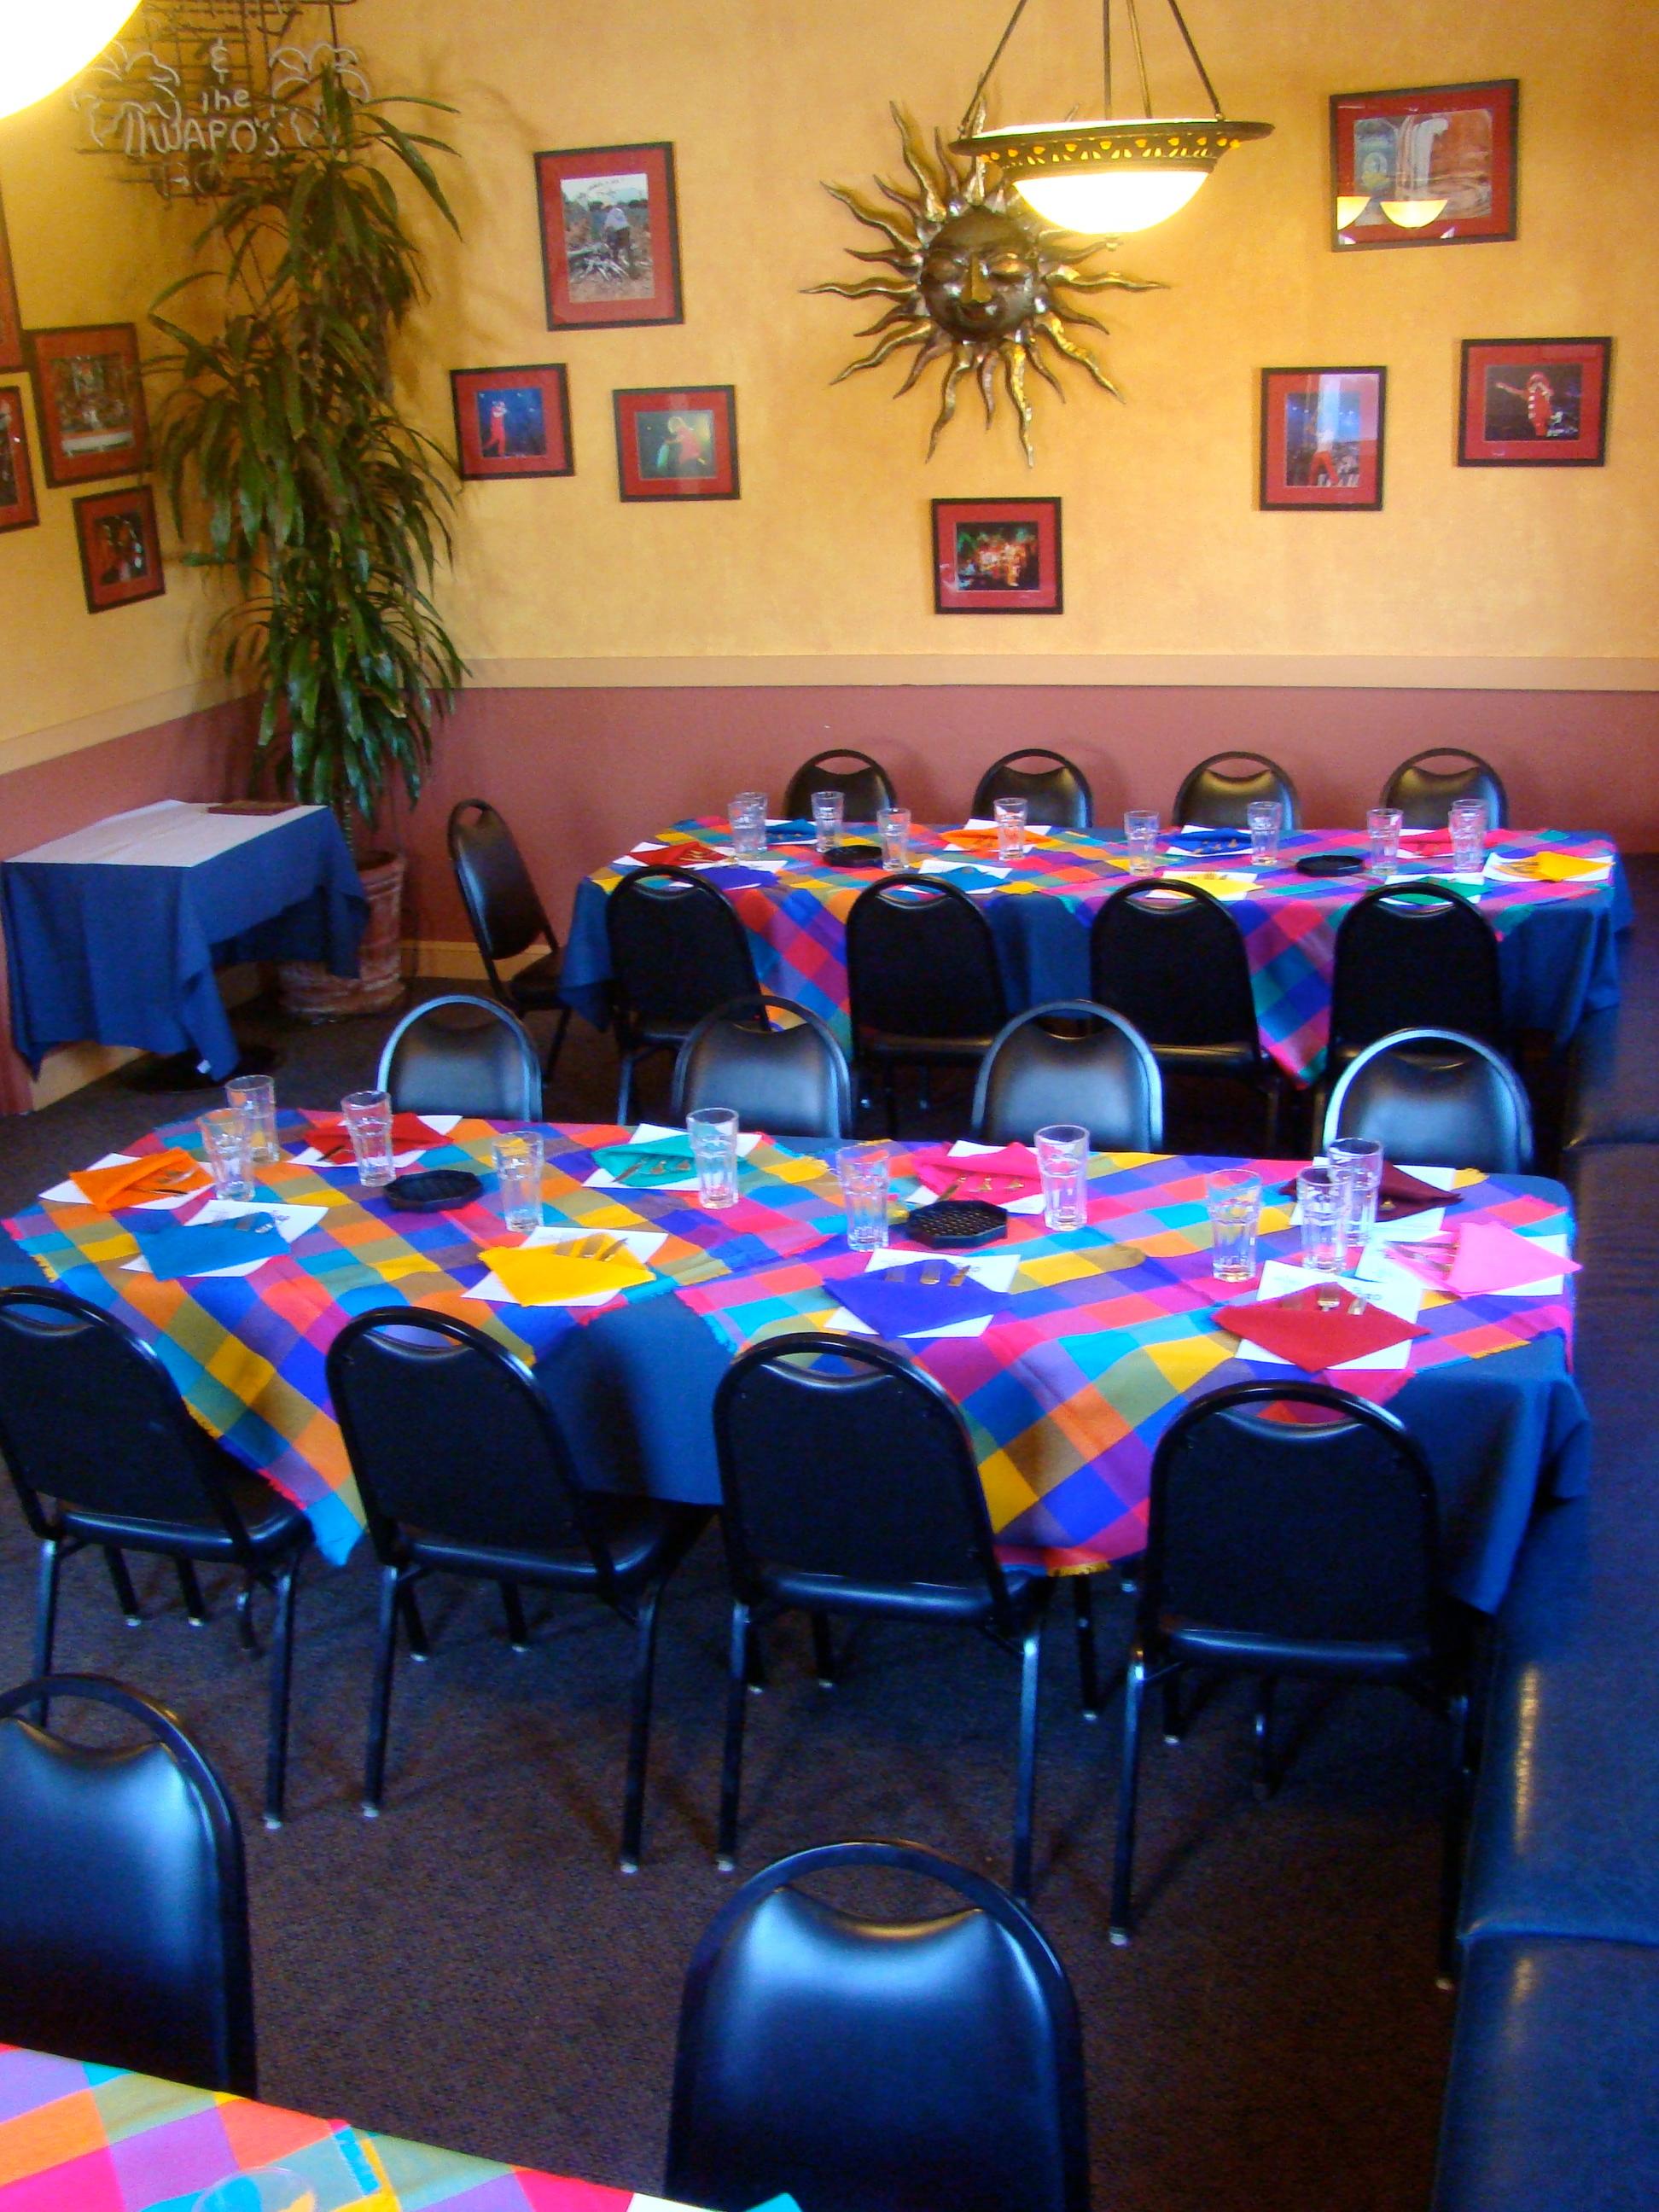 Saylor's Restaurant & Bar image 9